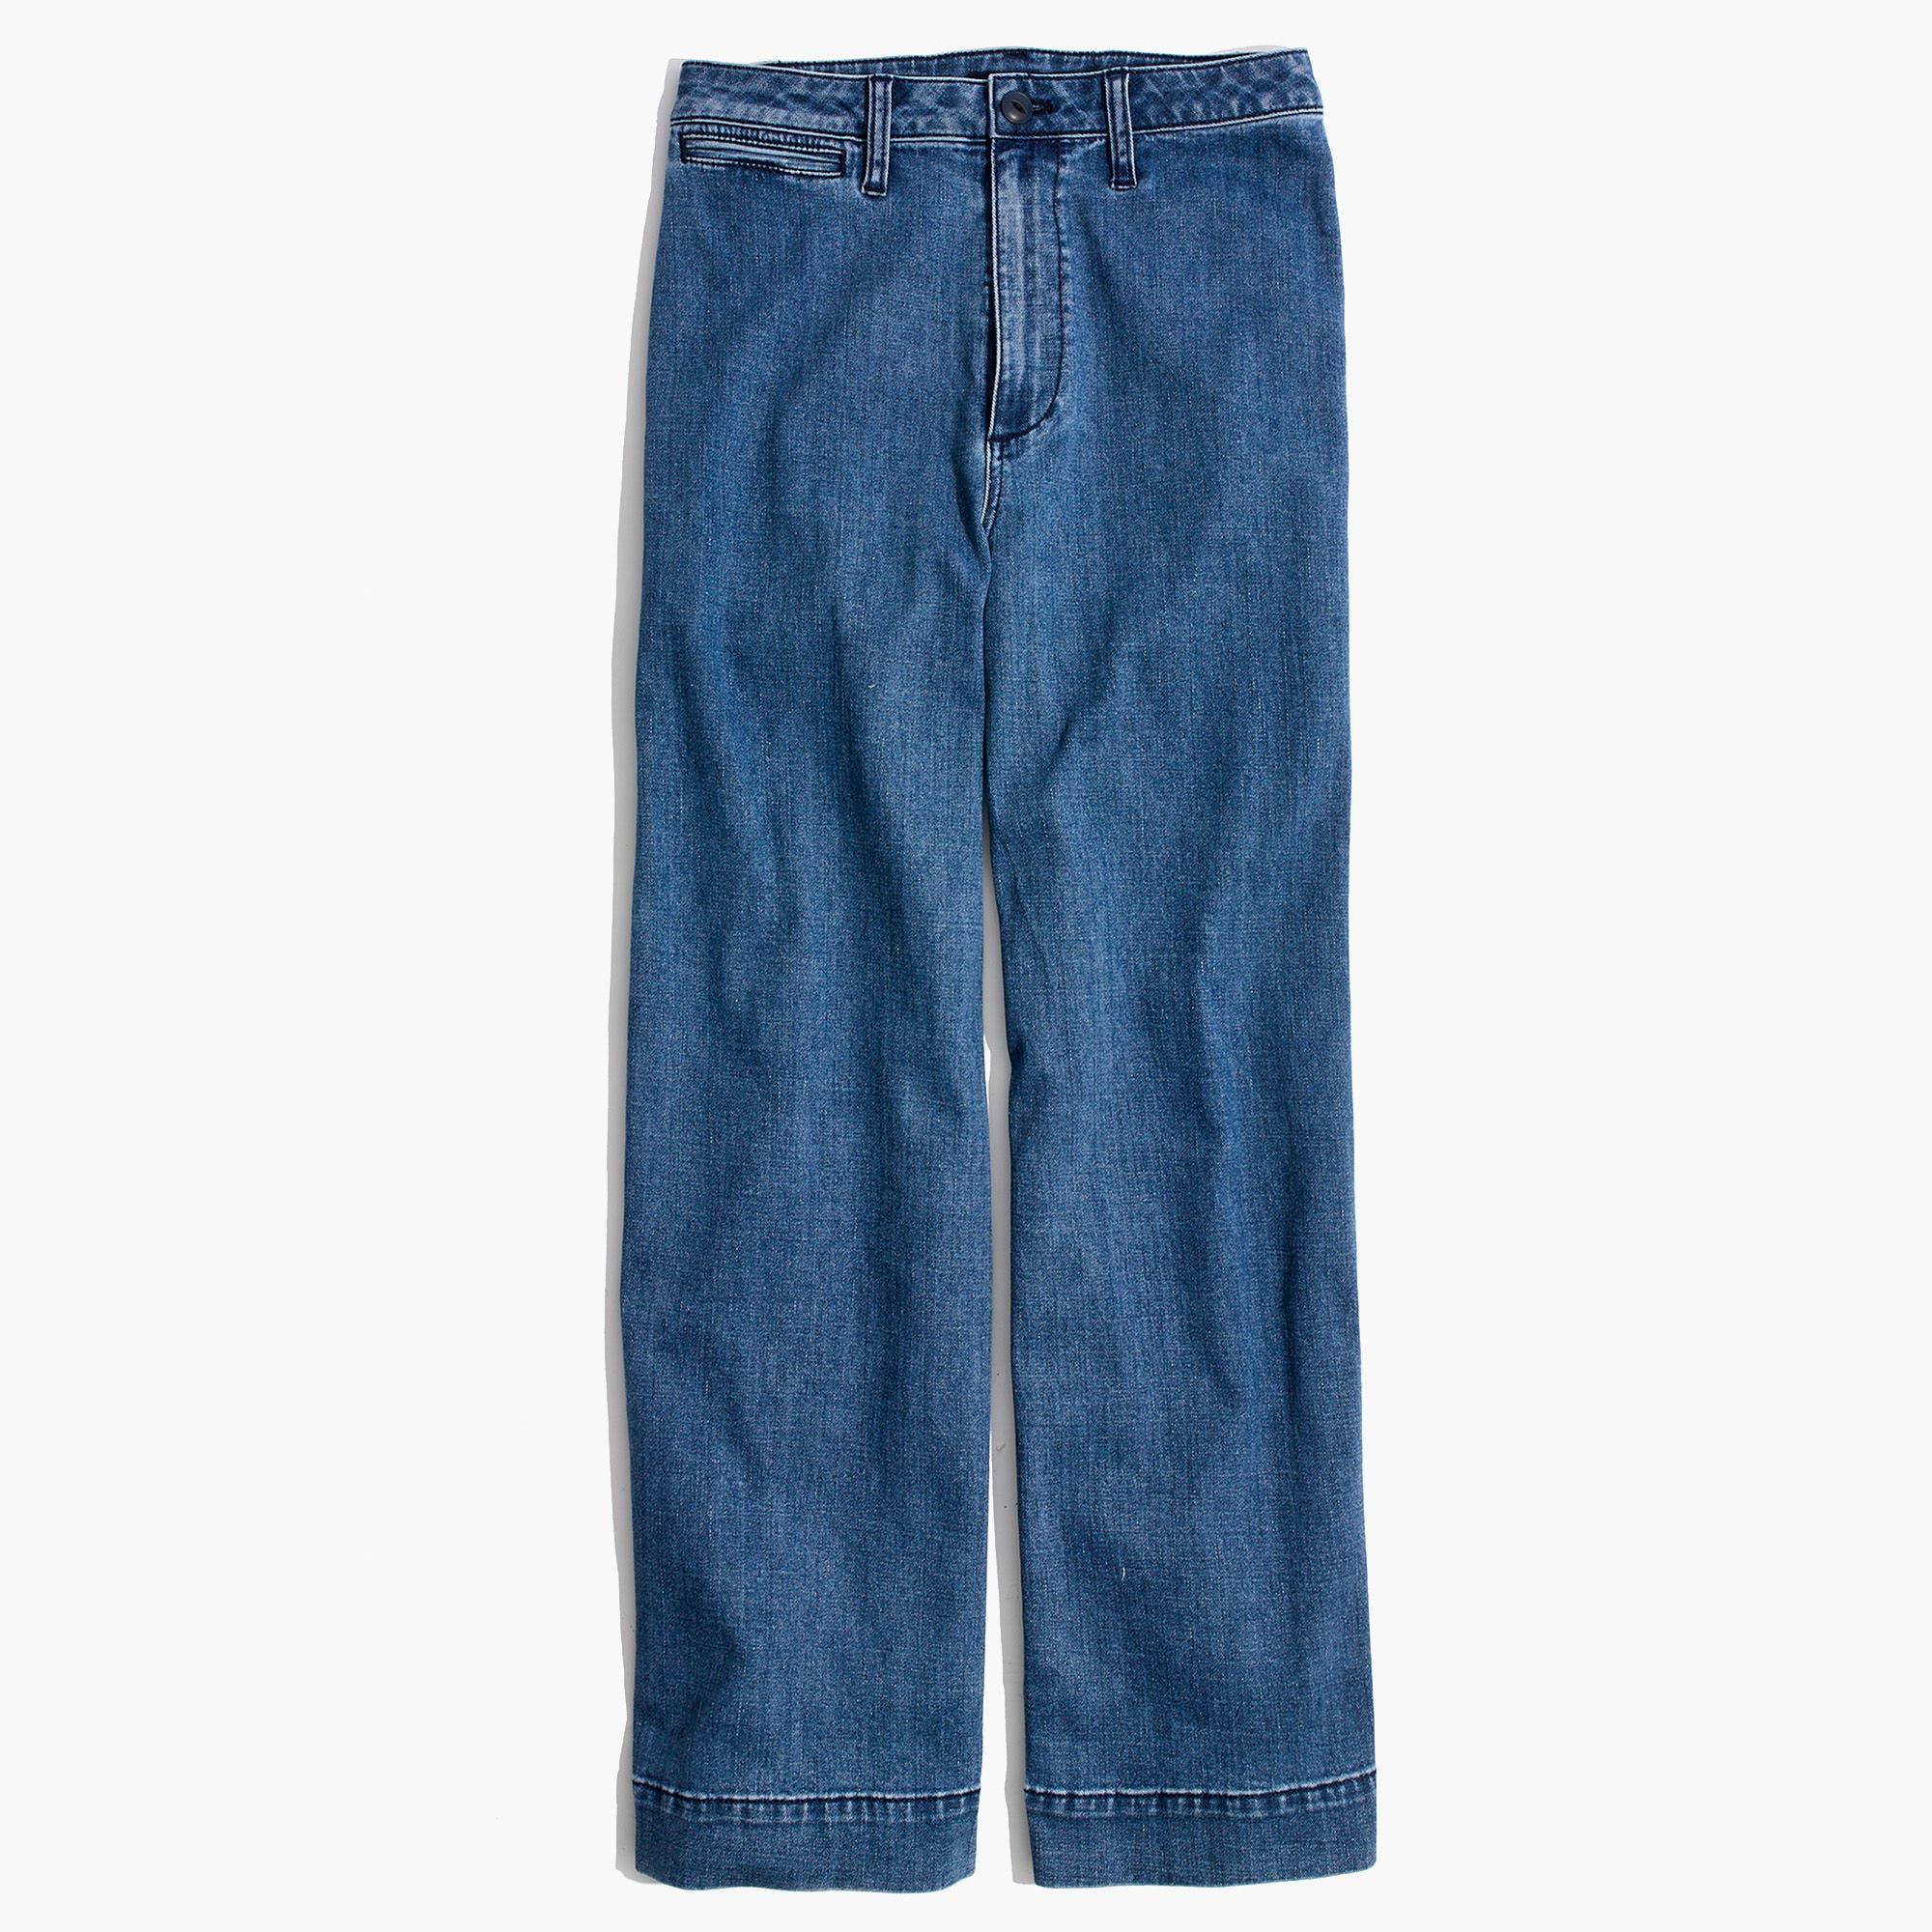 MADEWELL,                             Emmett Crop Wide Leg Jeans,                             Alternate thumbnail 3, color,                             ROSALIE